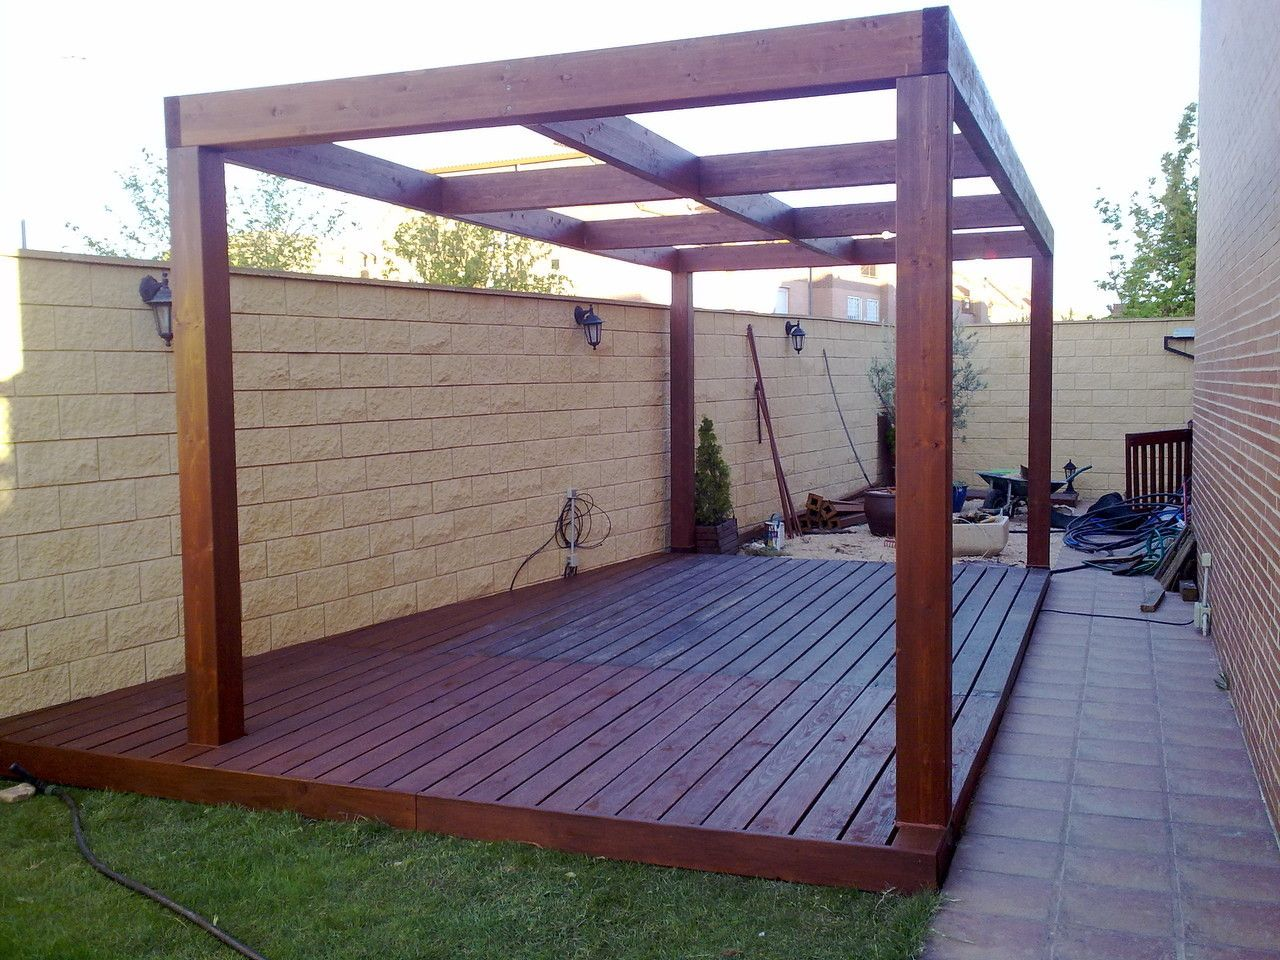 Pergolas baratas para jardin cheap pergolas madera sombra - Pergolas de madera baratas ...